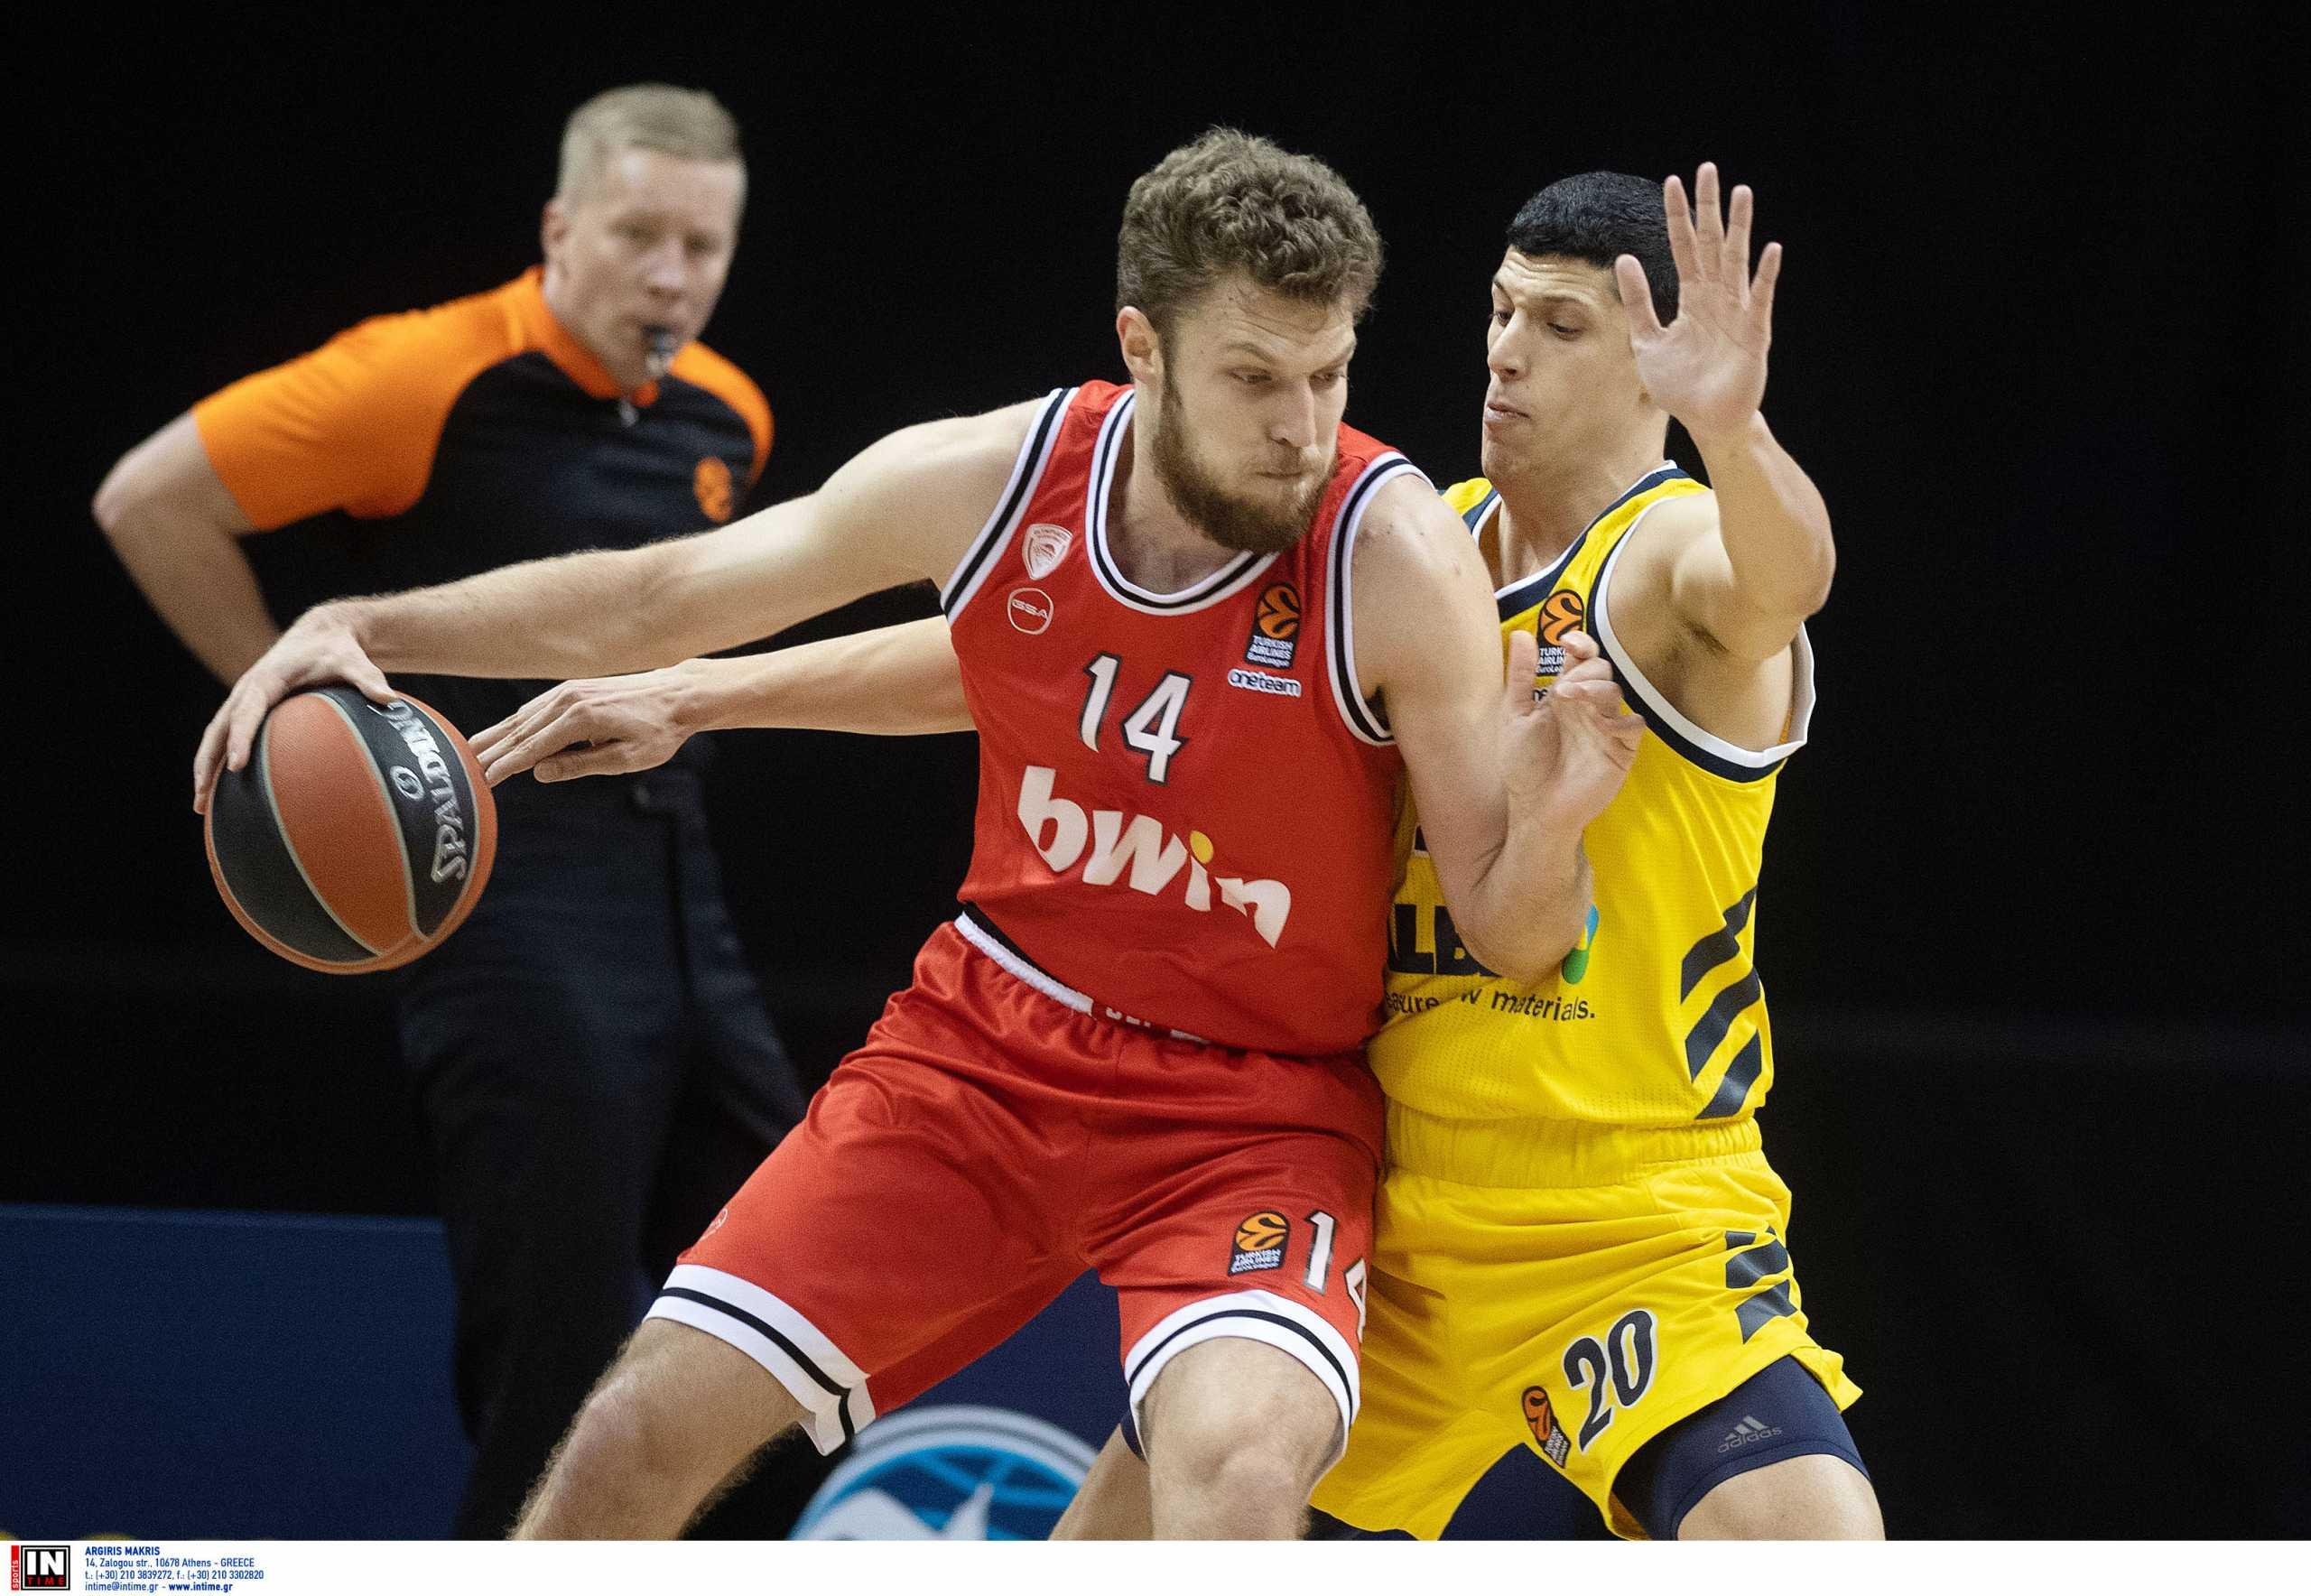 Euroleague: ΜVP της 30ης αγωνιστικής ο Βεζένκοφ